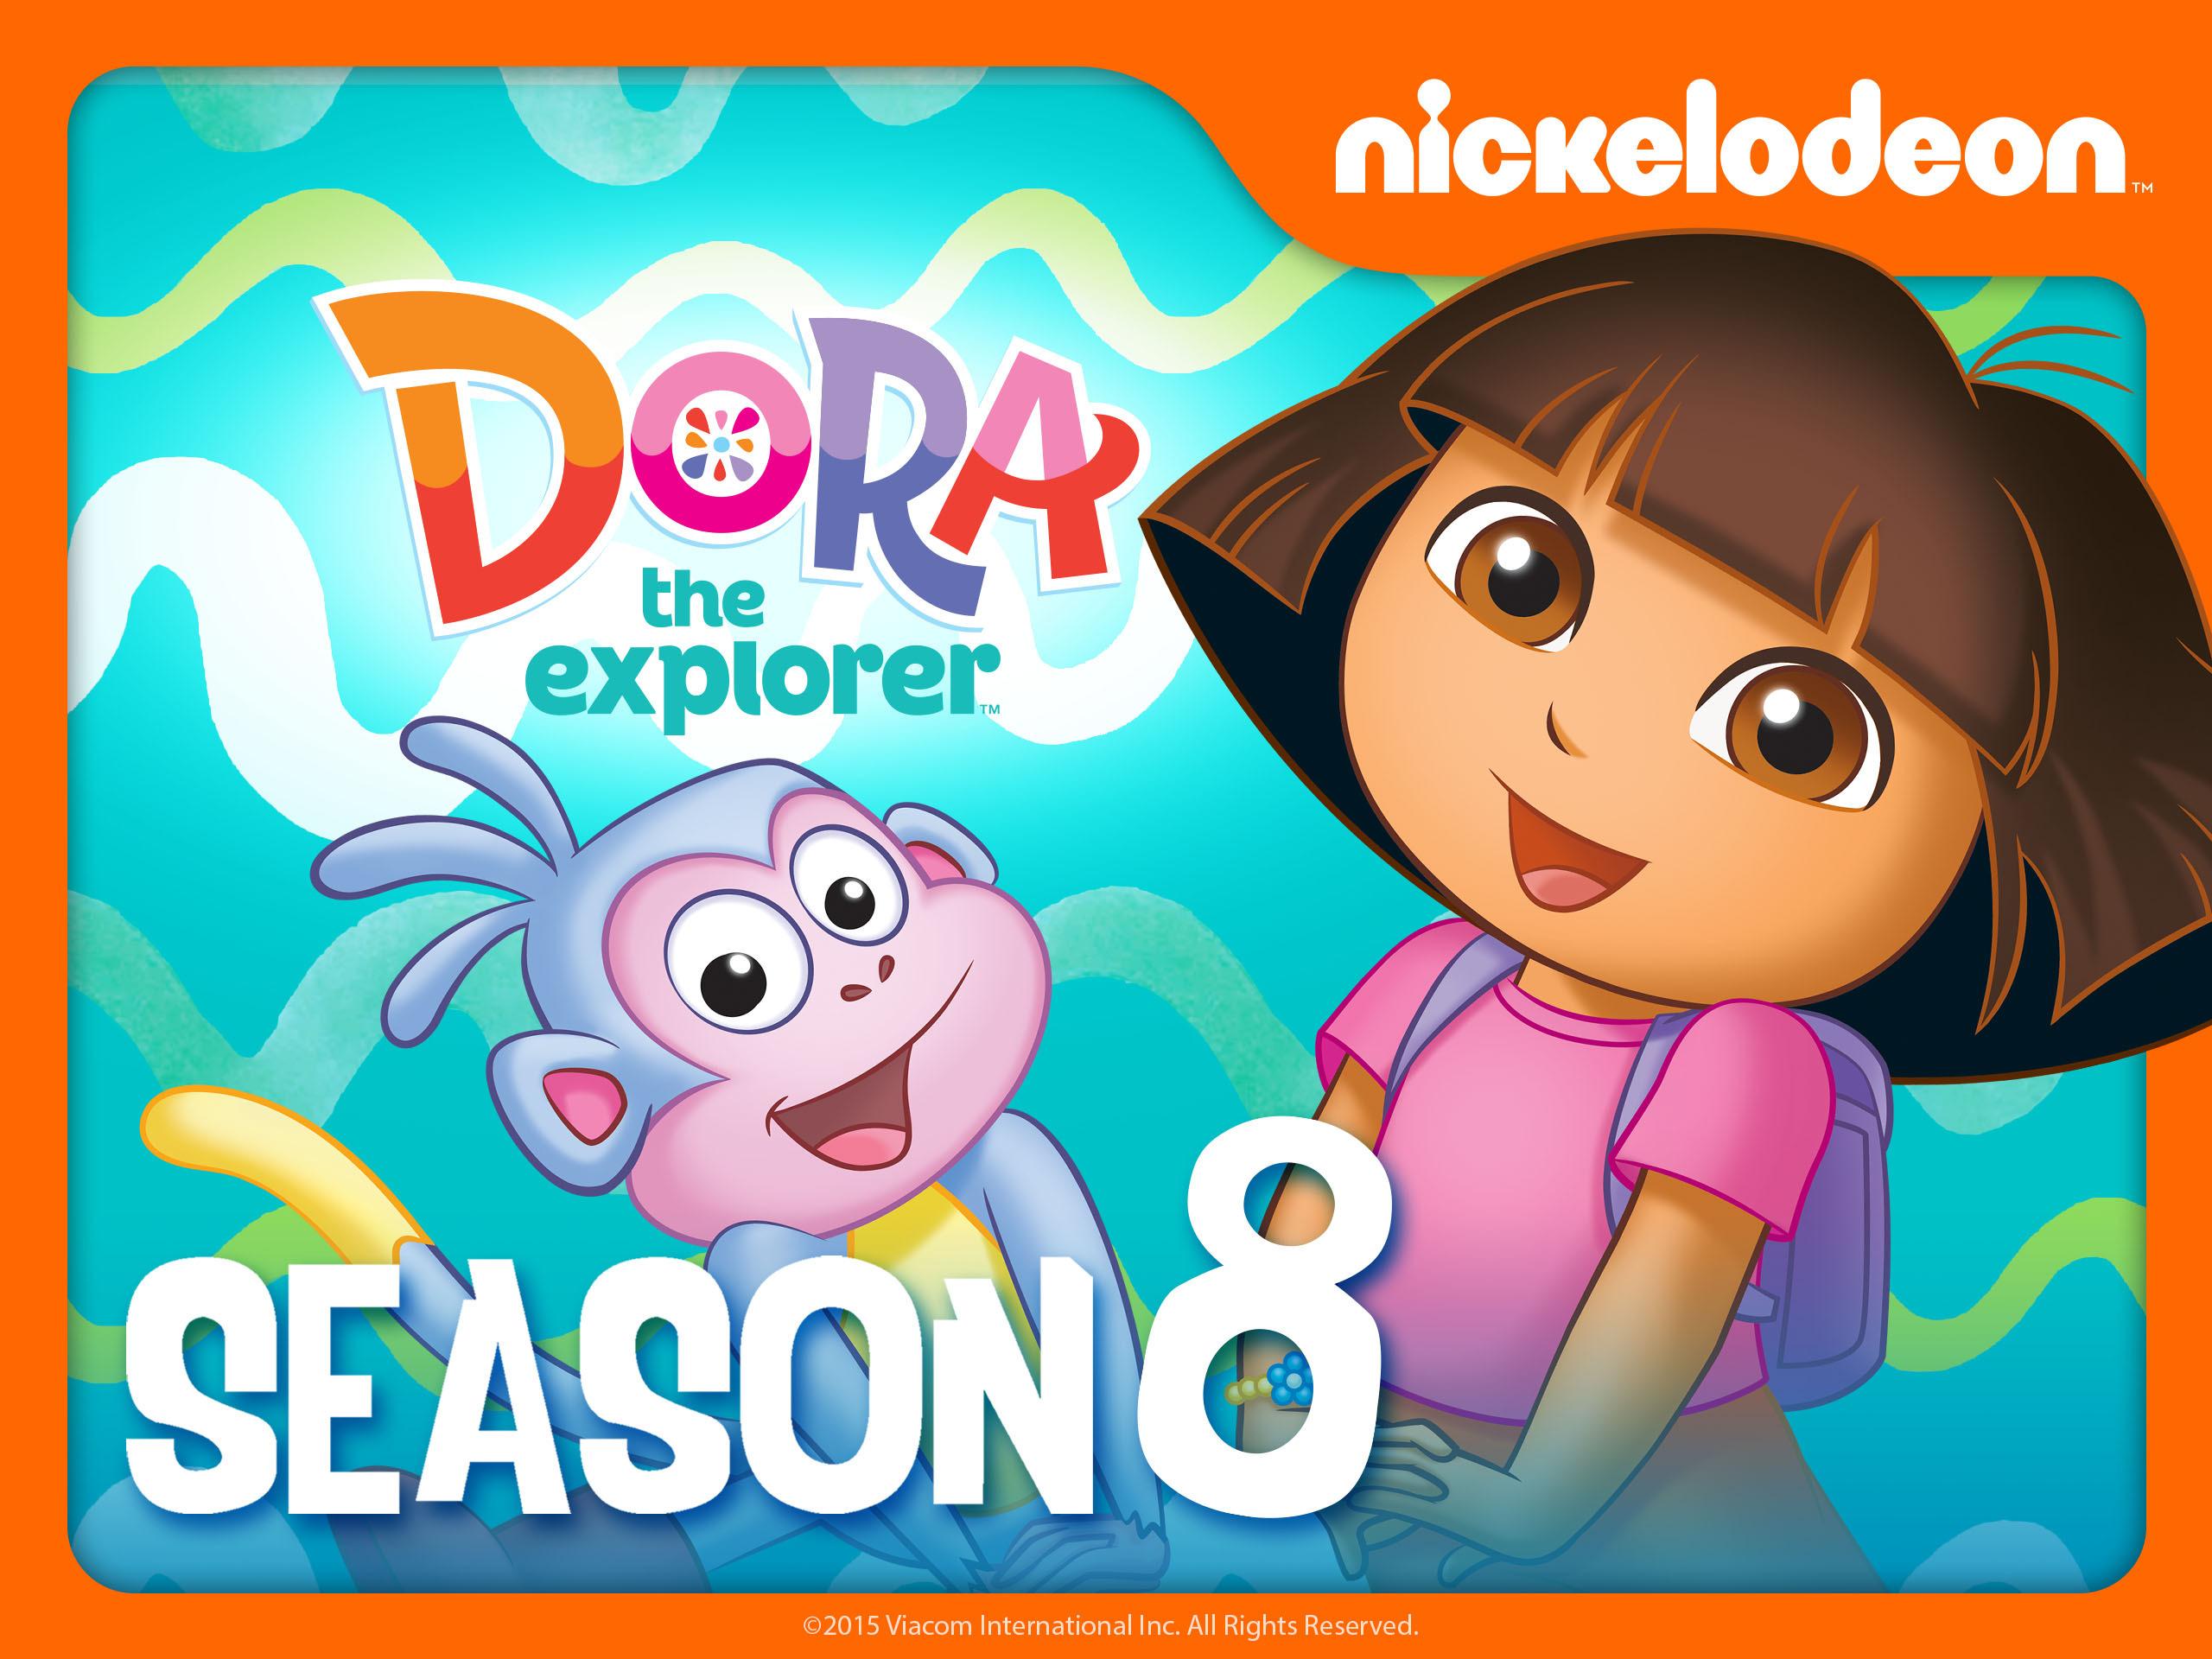 Prime Video: Dora the Explorer Season 4